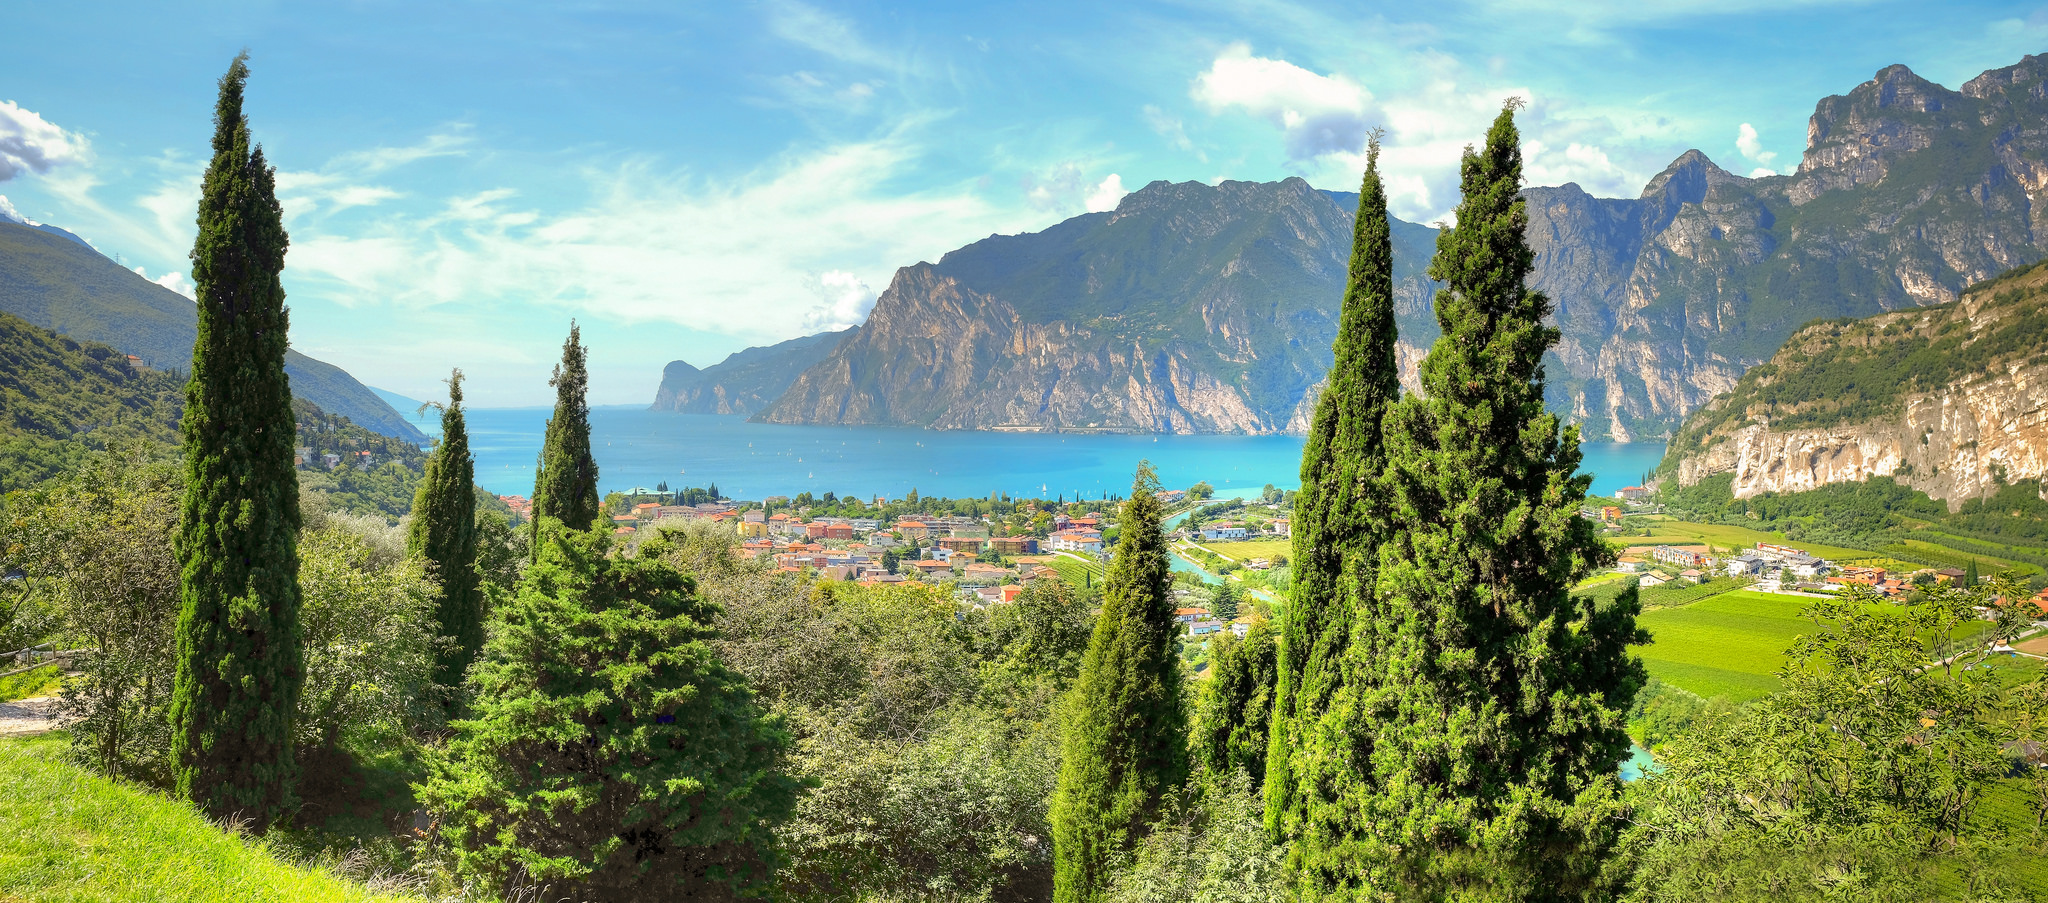 Bolzano Resiapass Mantova Bike Tour Italy Tripsite